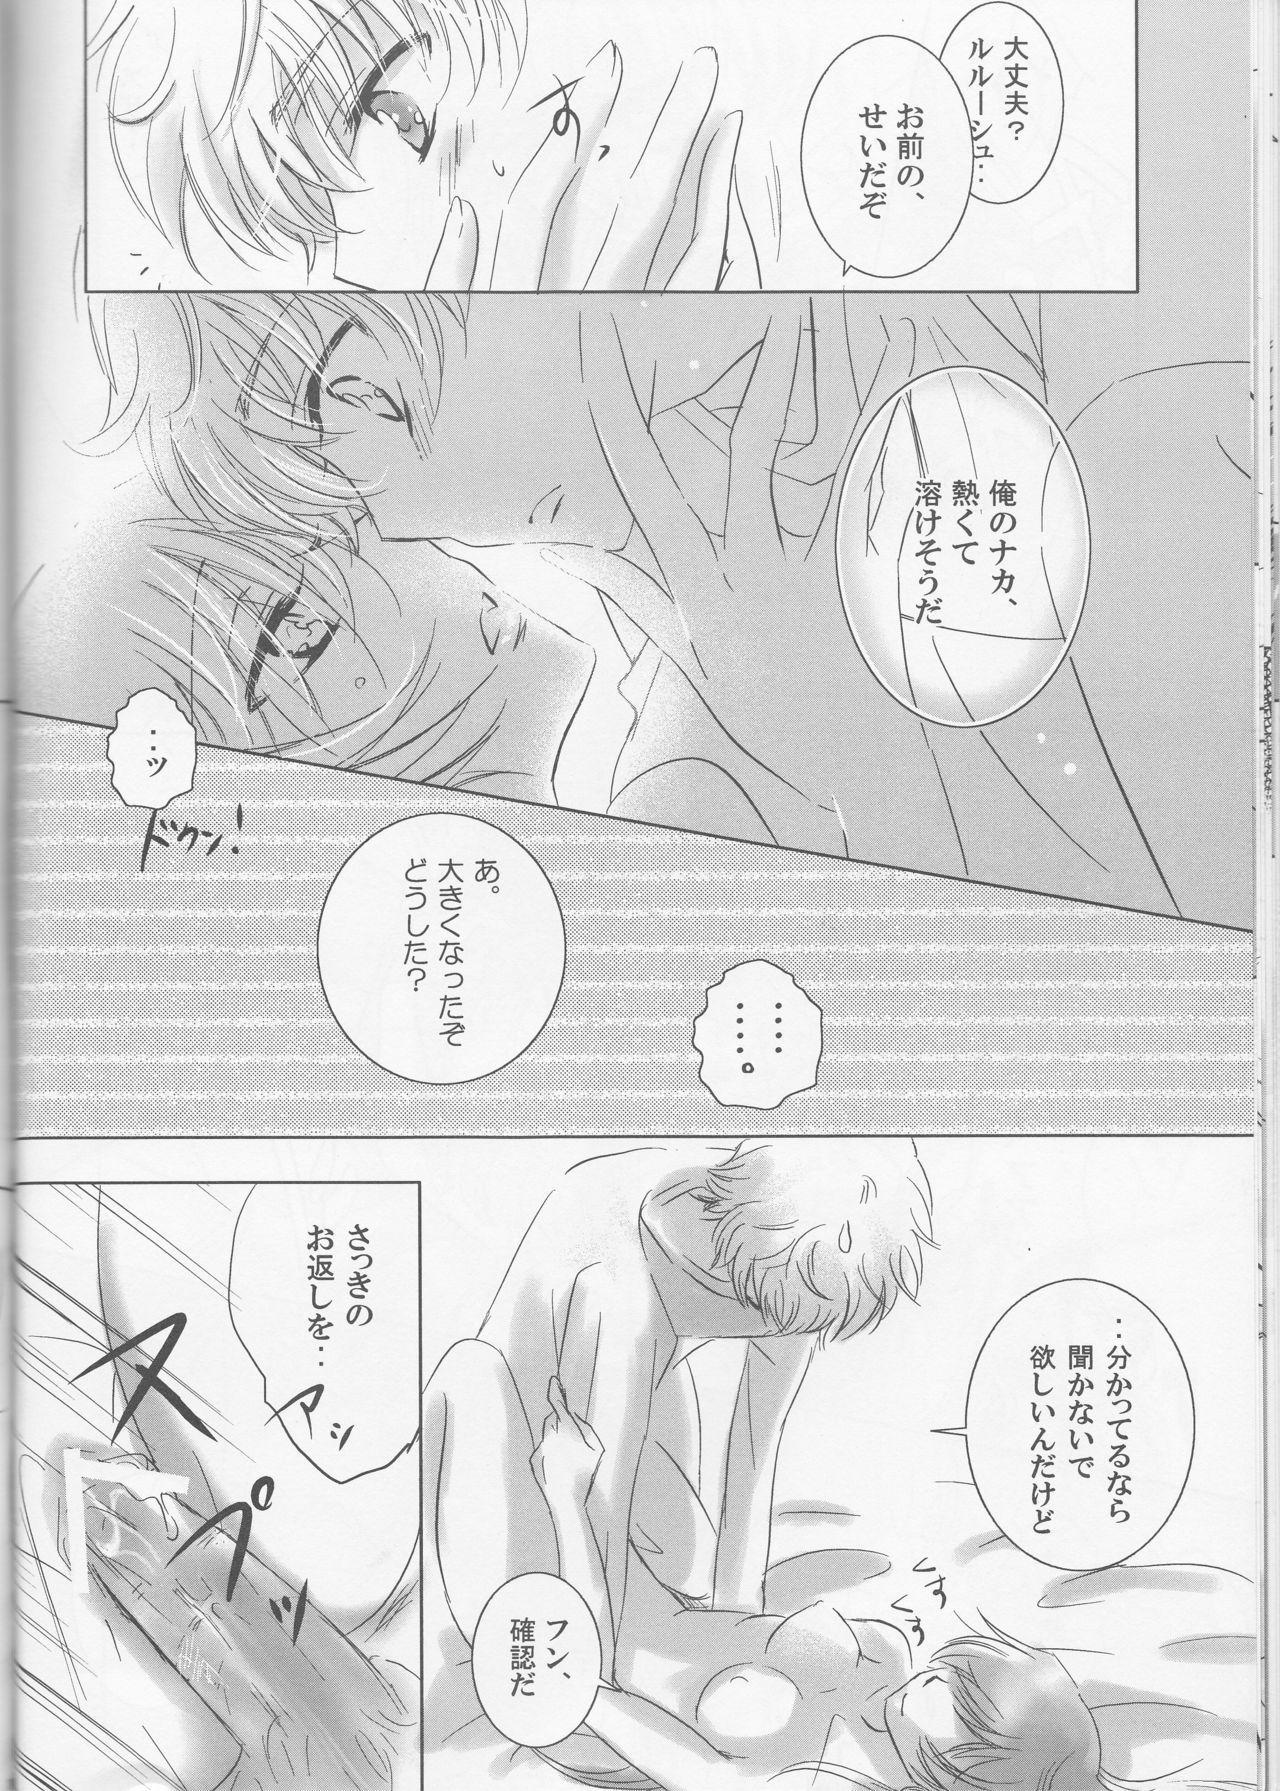 Mitaiken Ryouiki 17